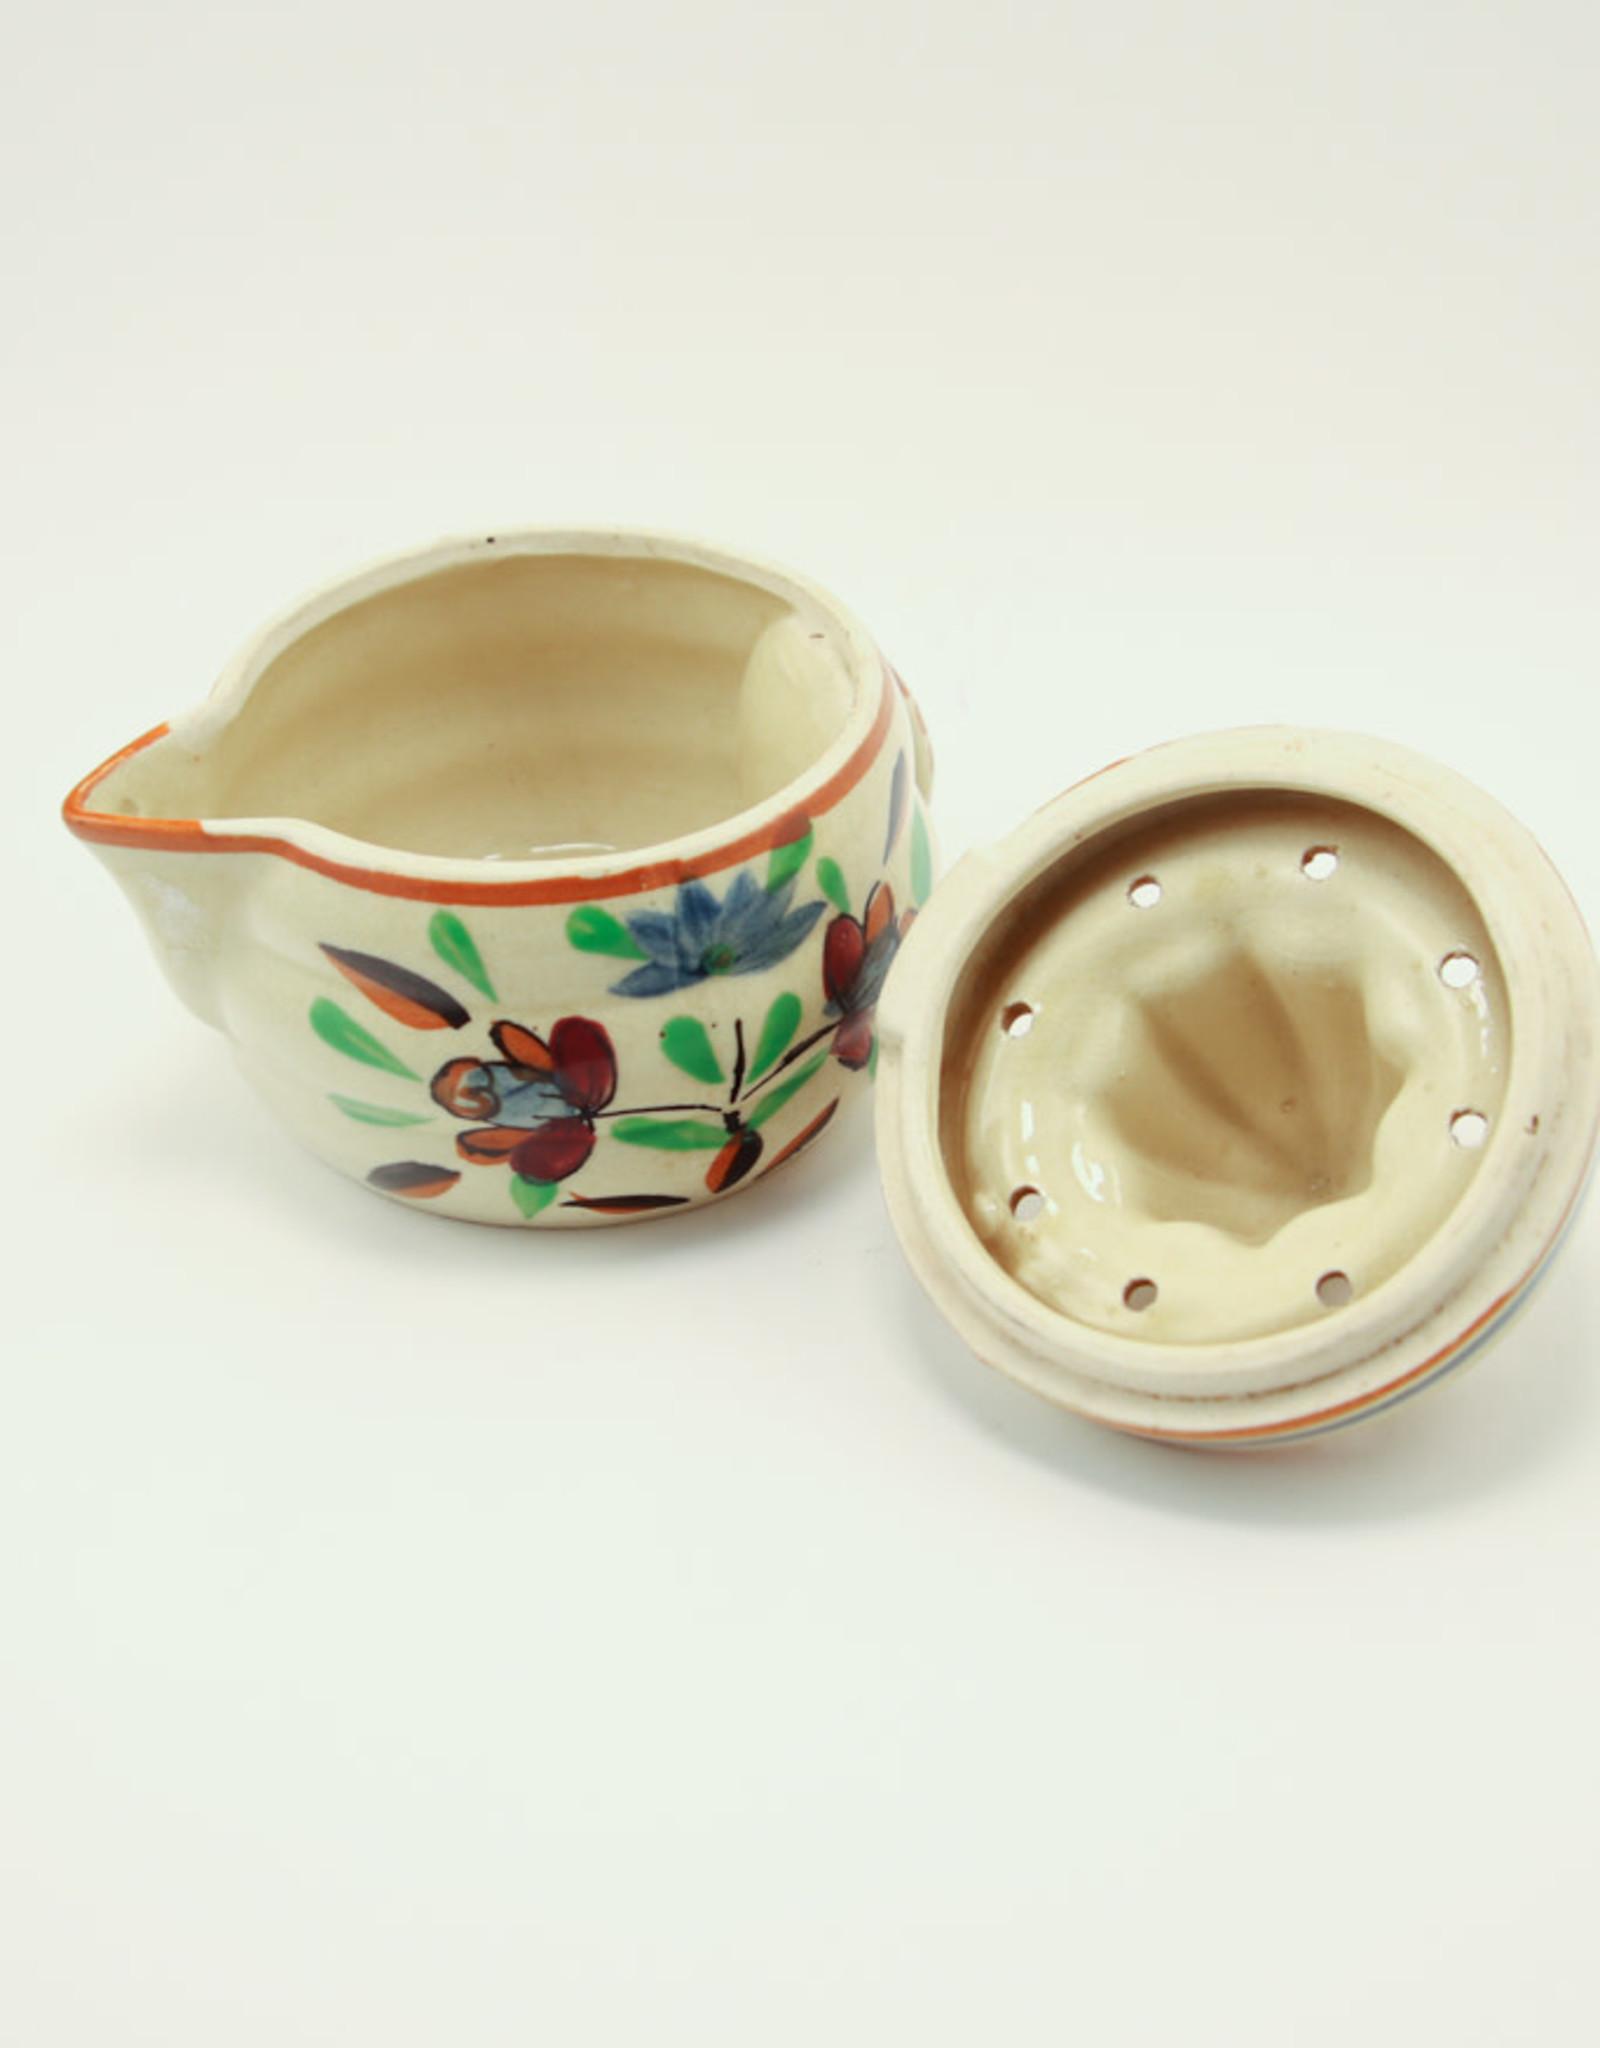 Vintage Japanese Majolica/Reamer & Pitcher